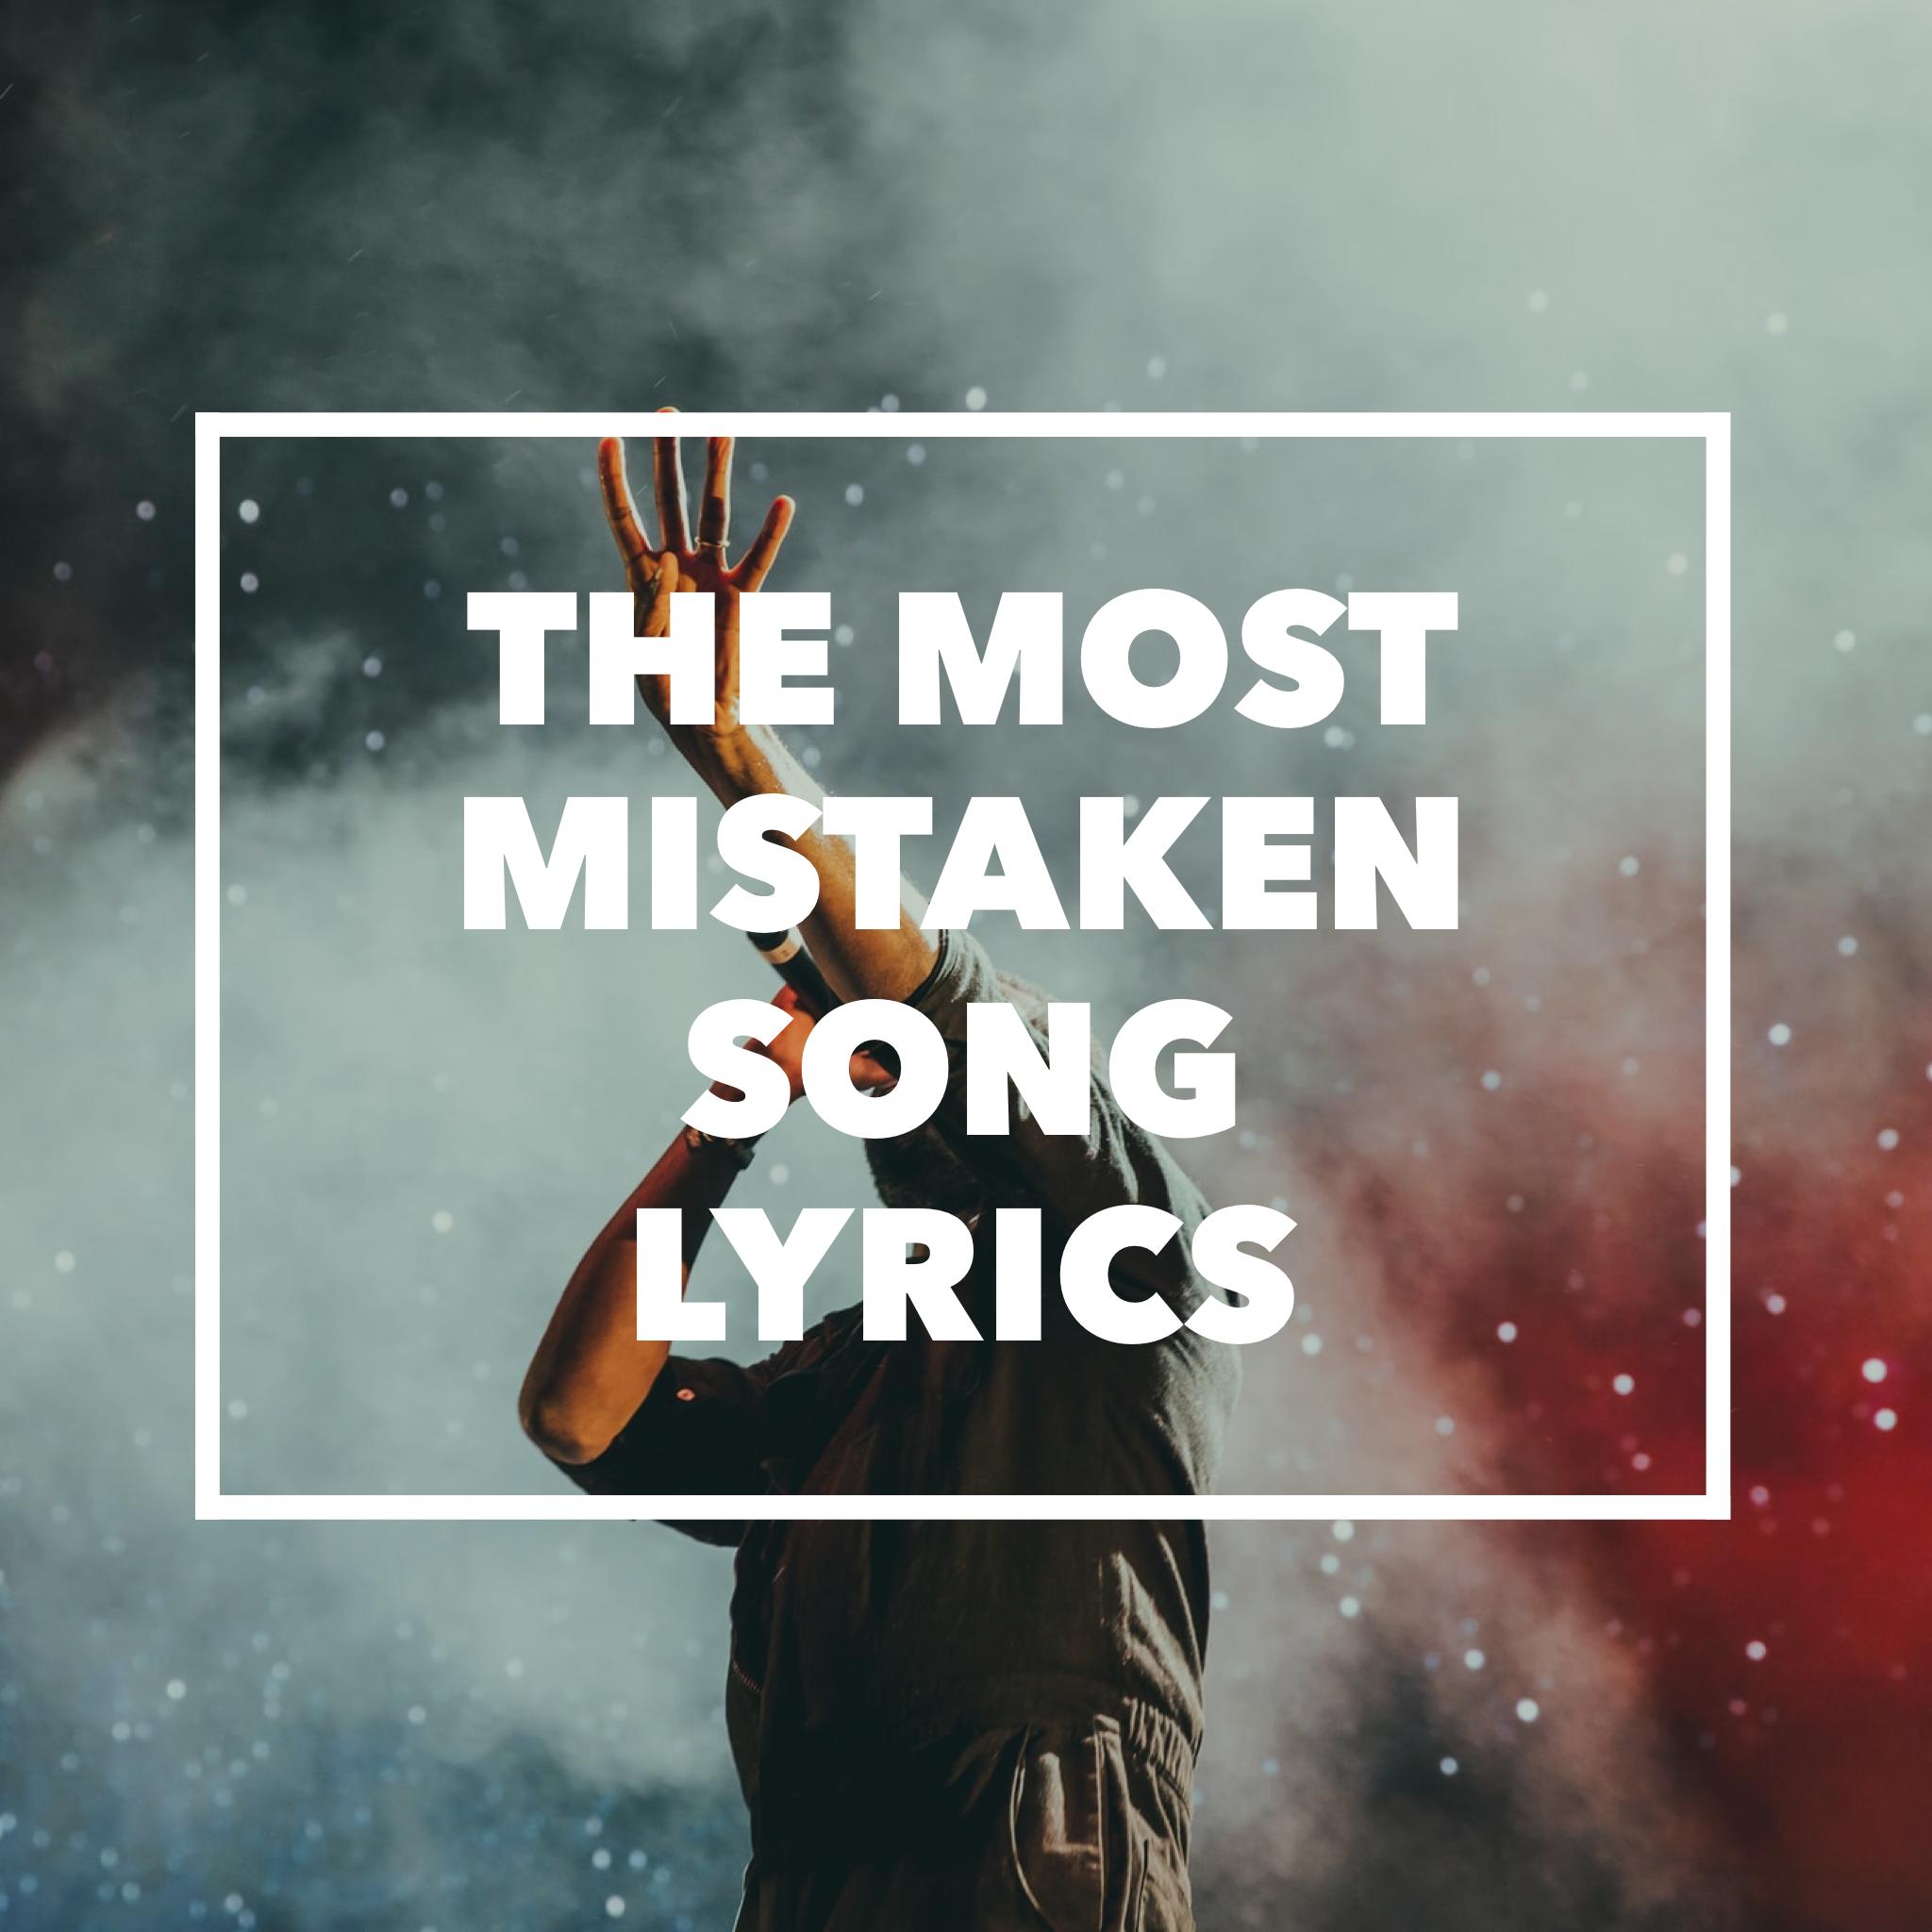 the most mistaken song lyrics